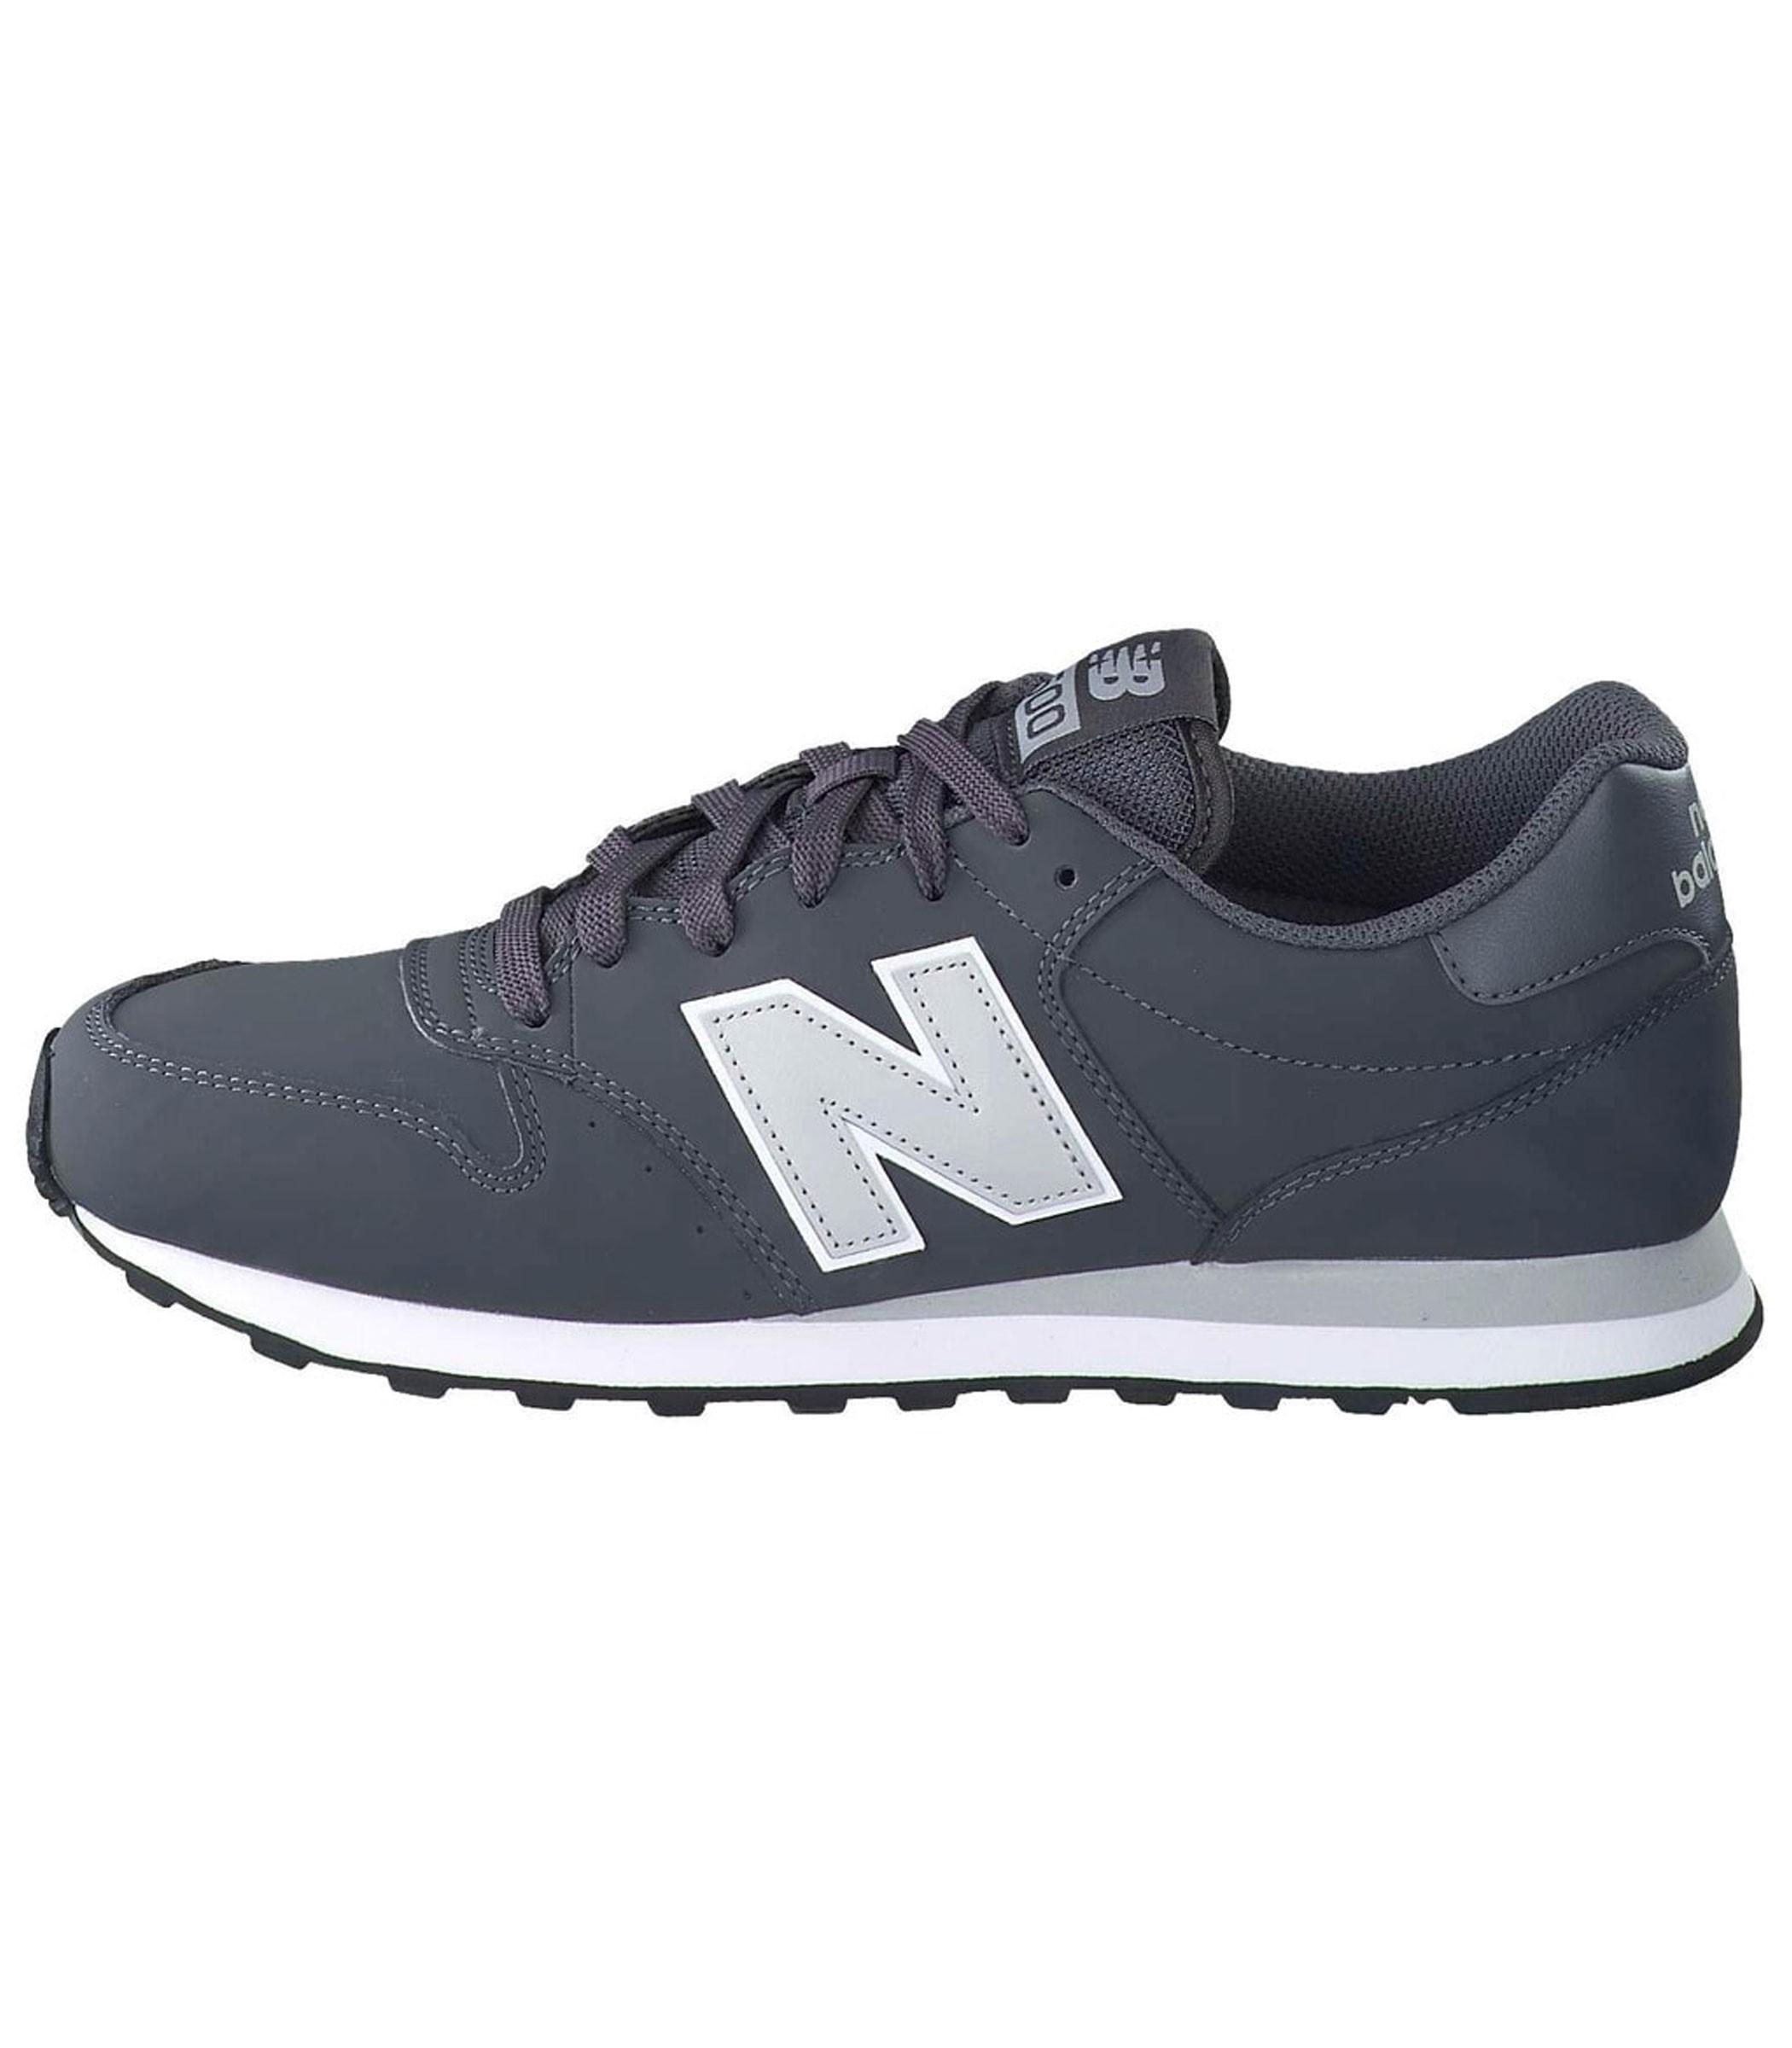 Scarpe Sneakers New Balance da uomo rif. GM500DGR fe993540501